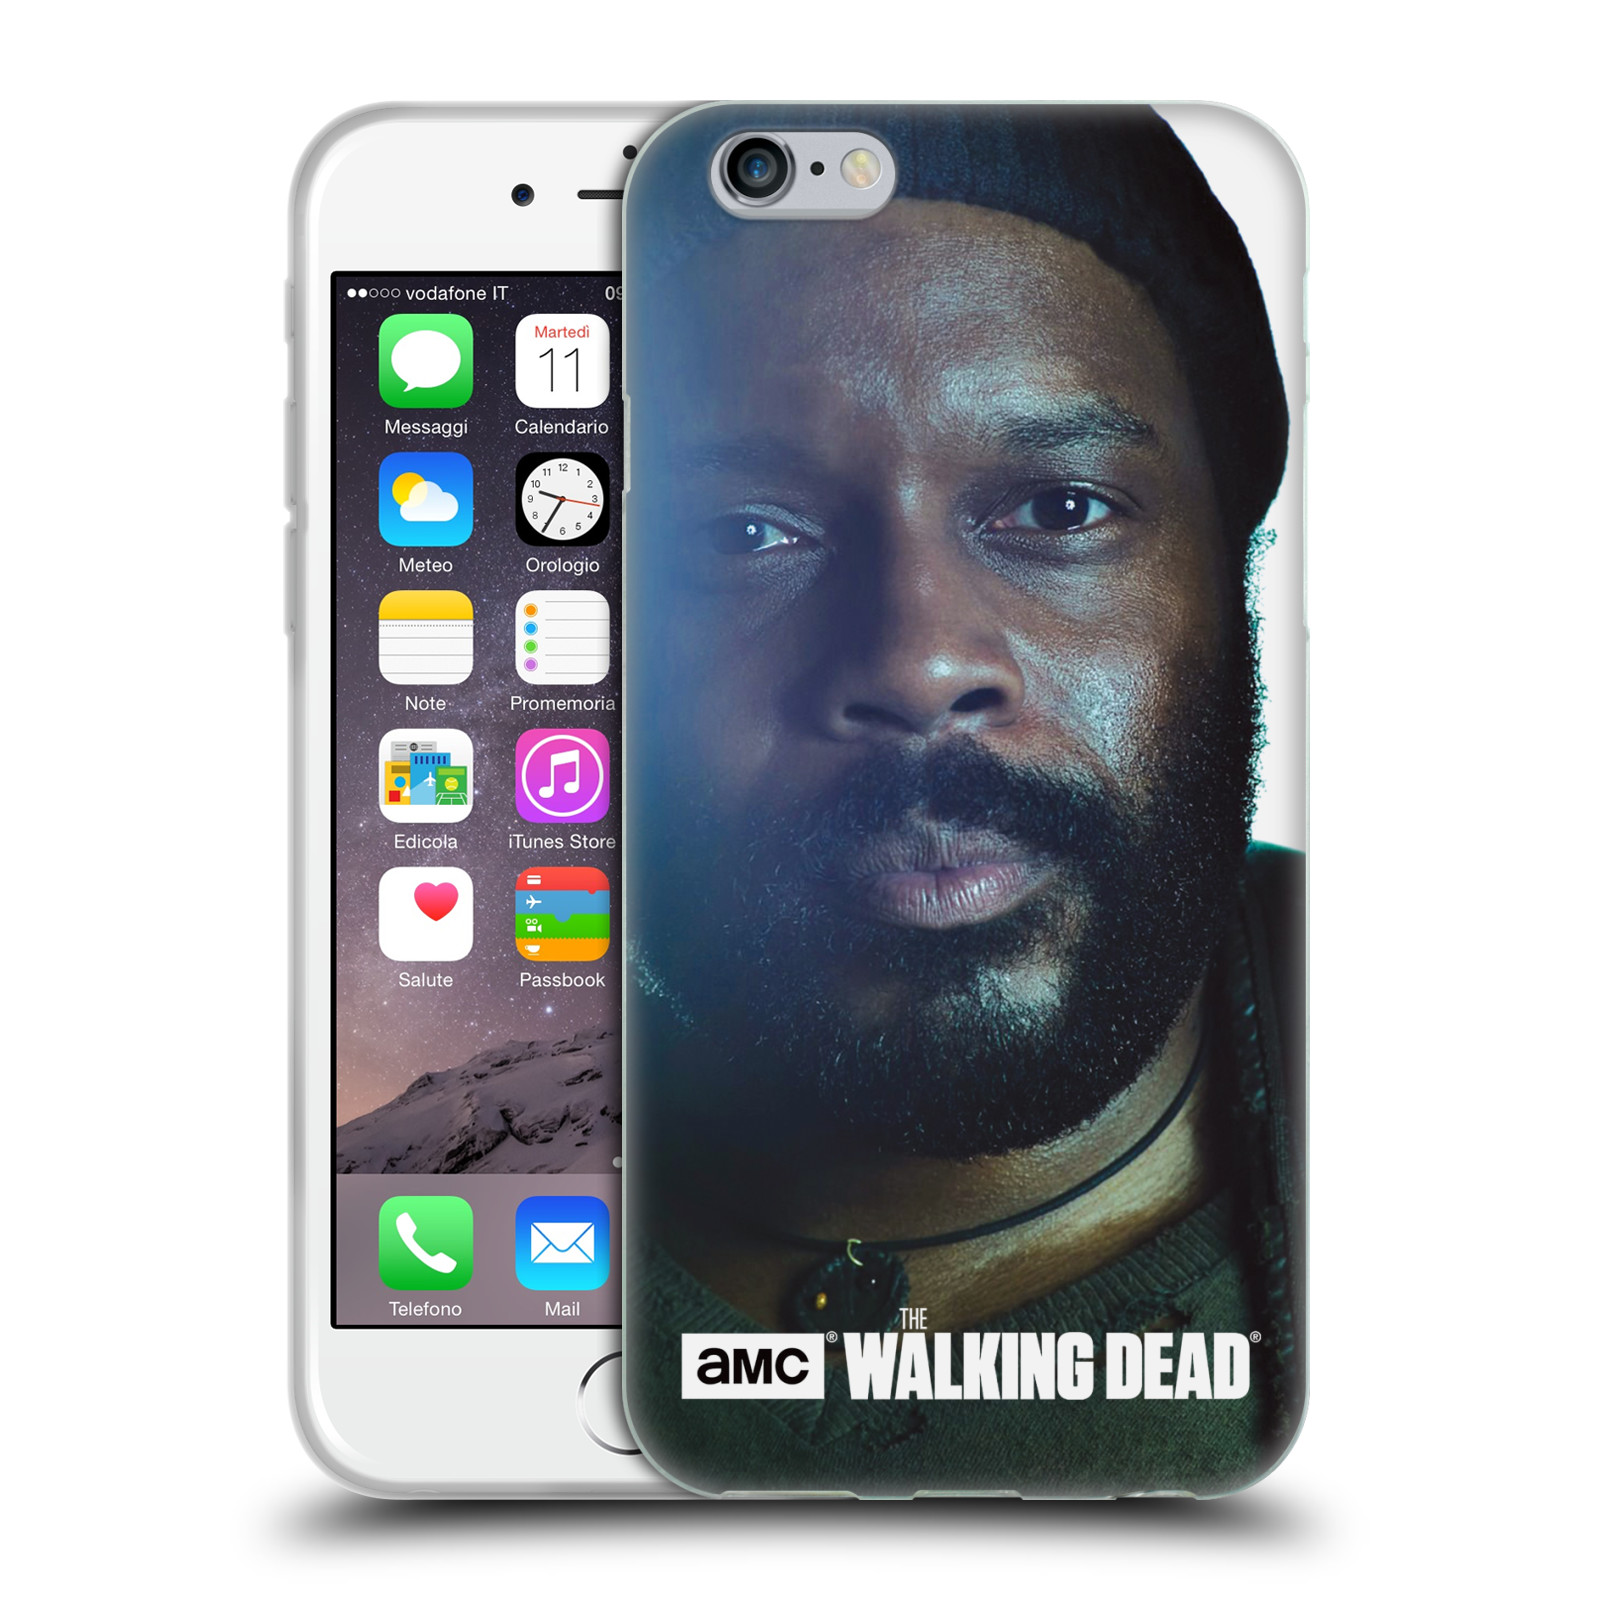 HEAD CASE silikonový obal na mobil Apple Iphone 6 / 6S originální potisk Walking Dead postavy Tyreese